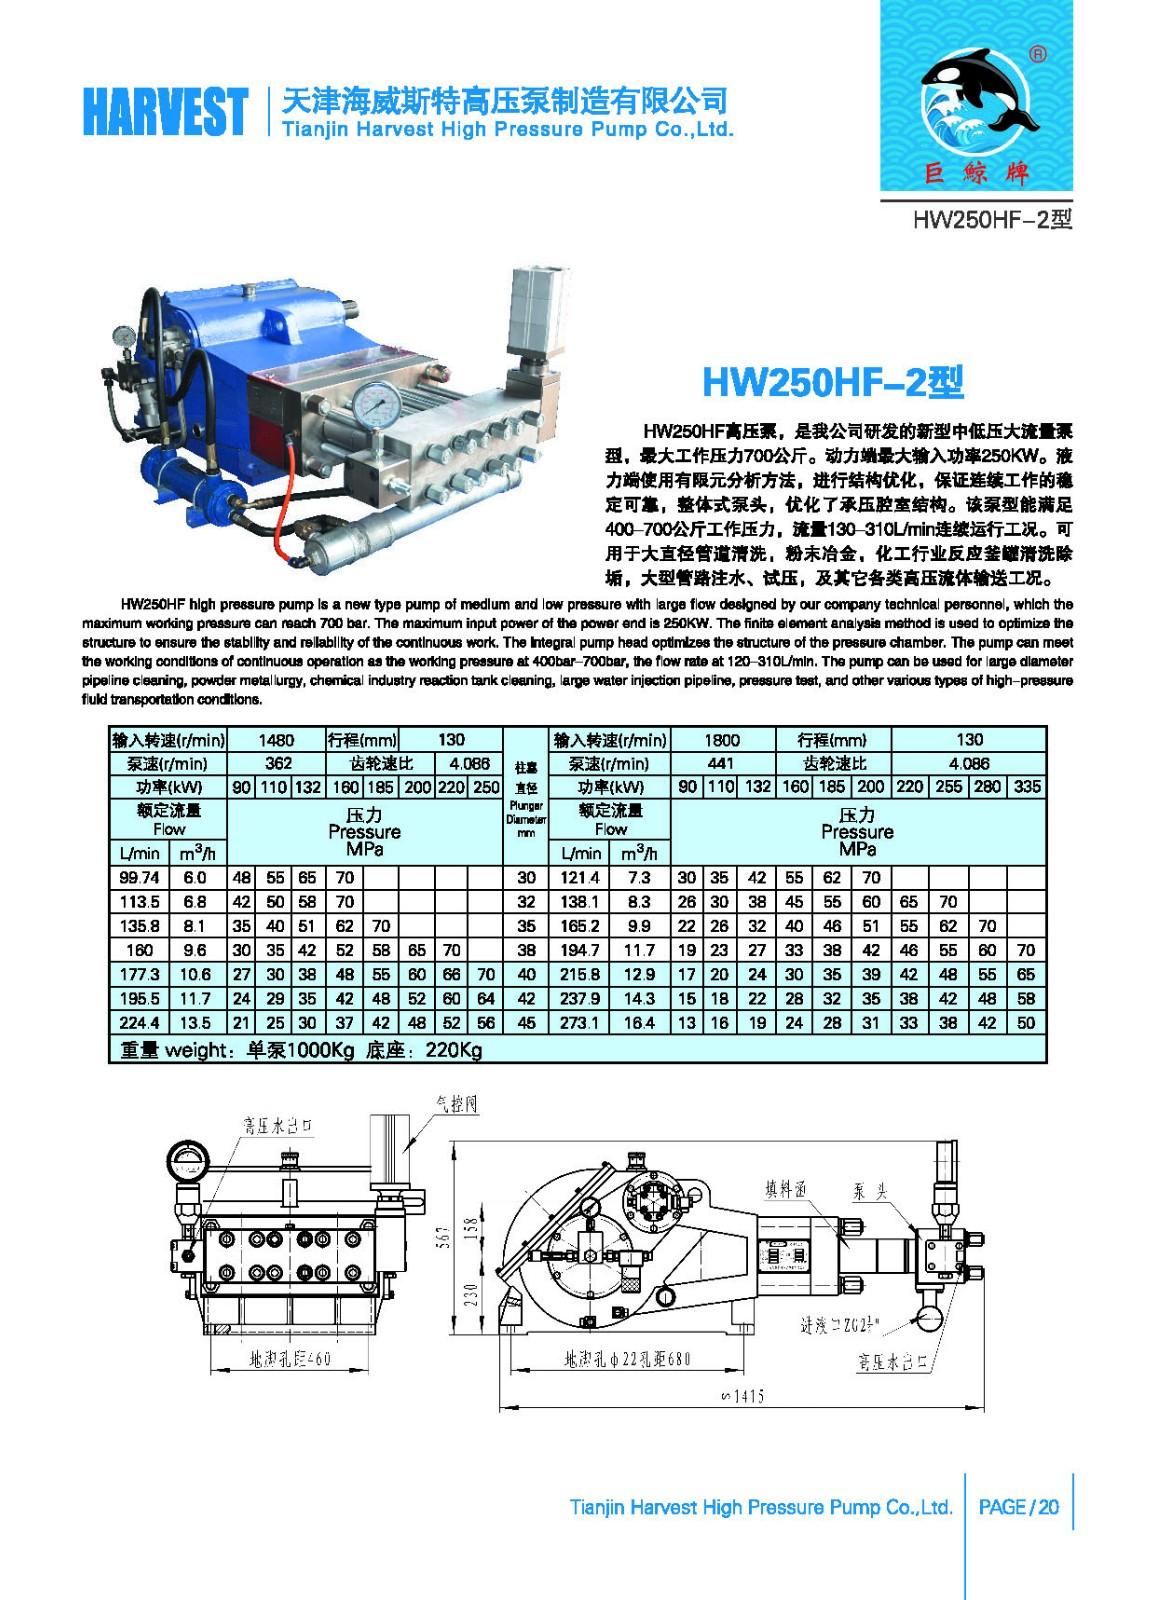 HW250HF 参数表2.jpg